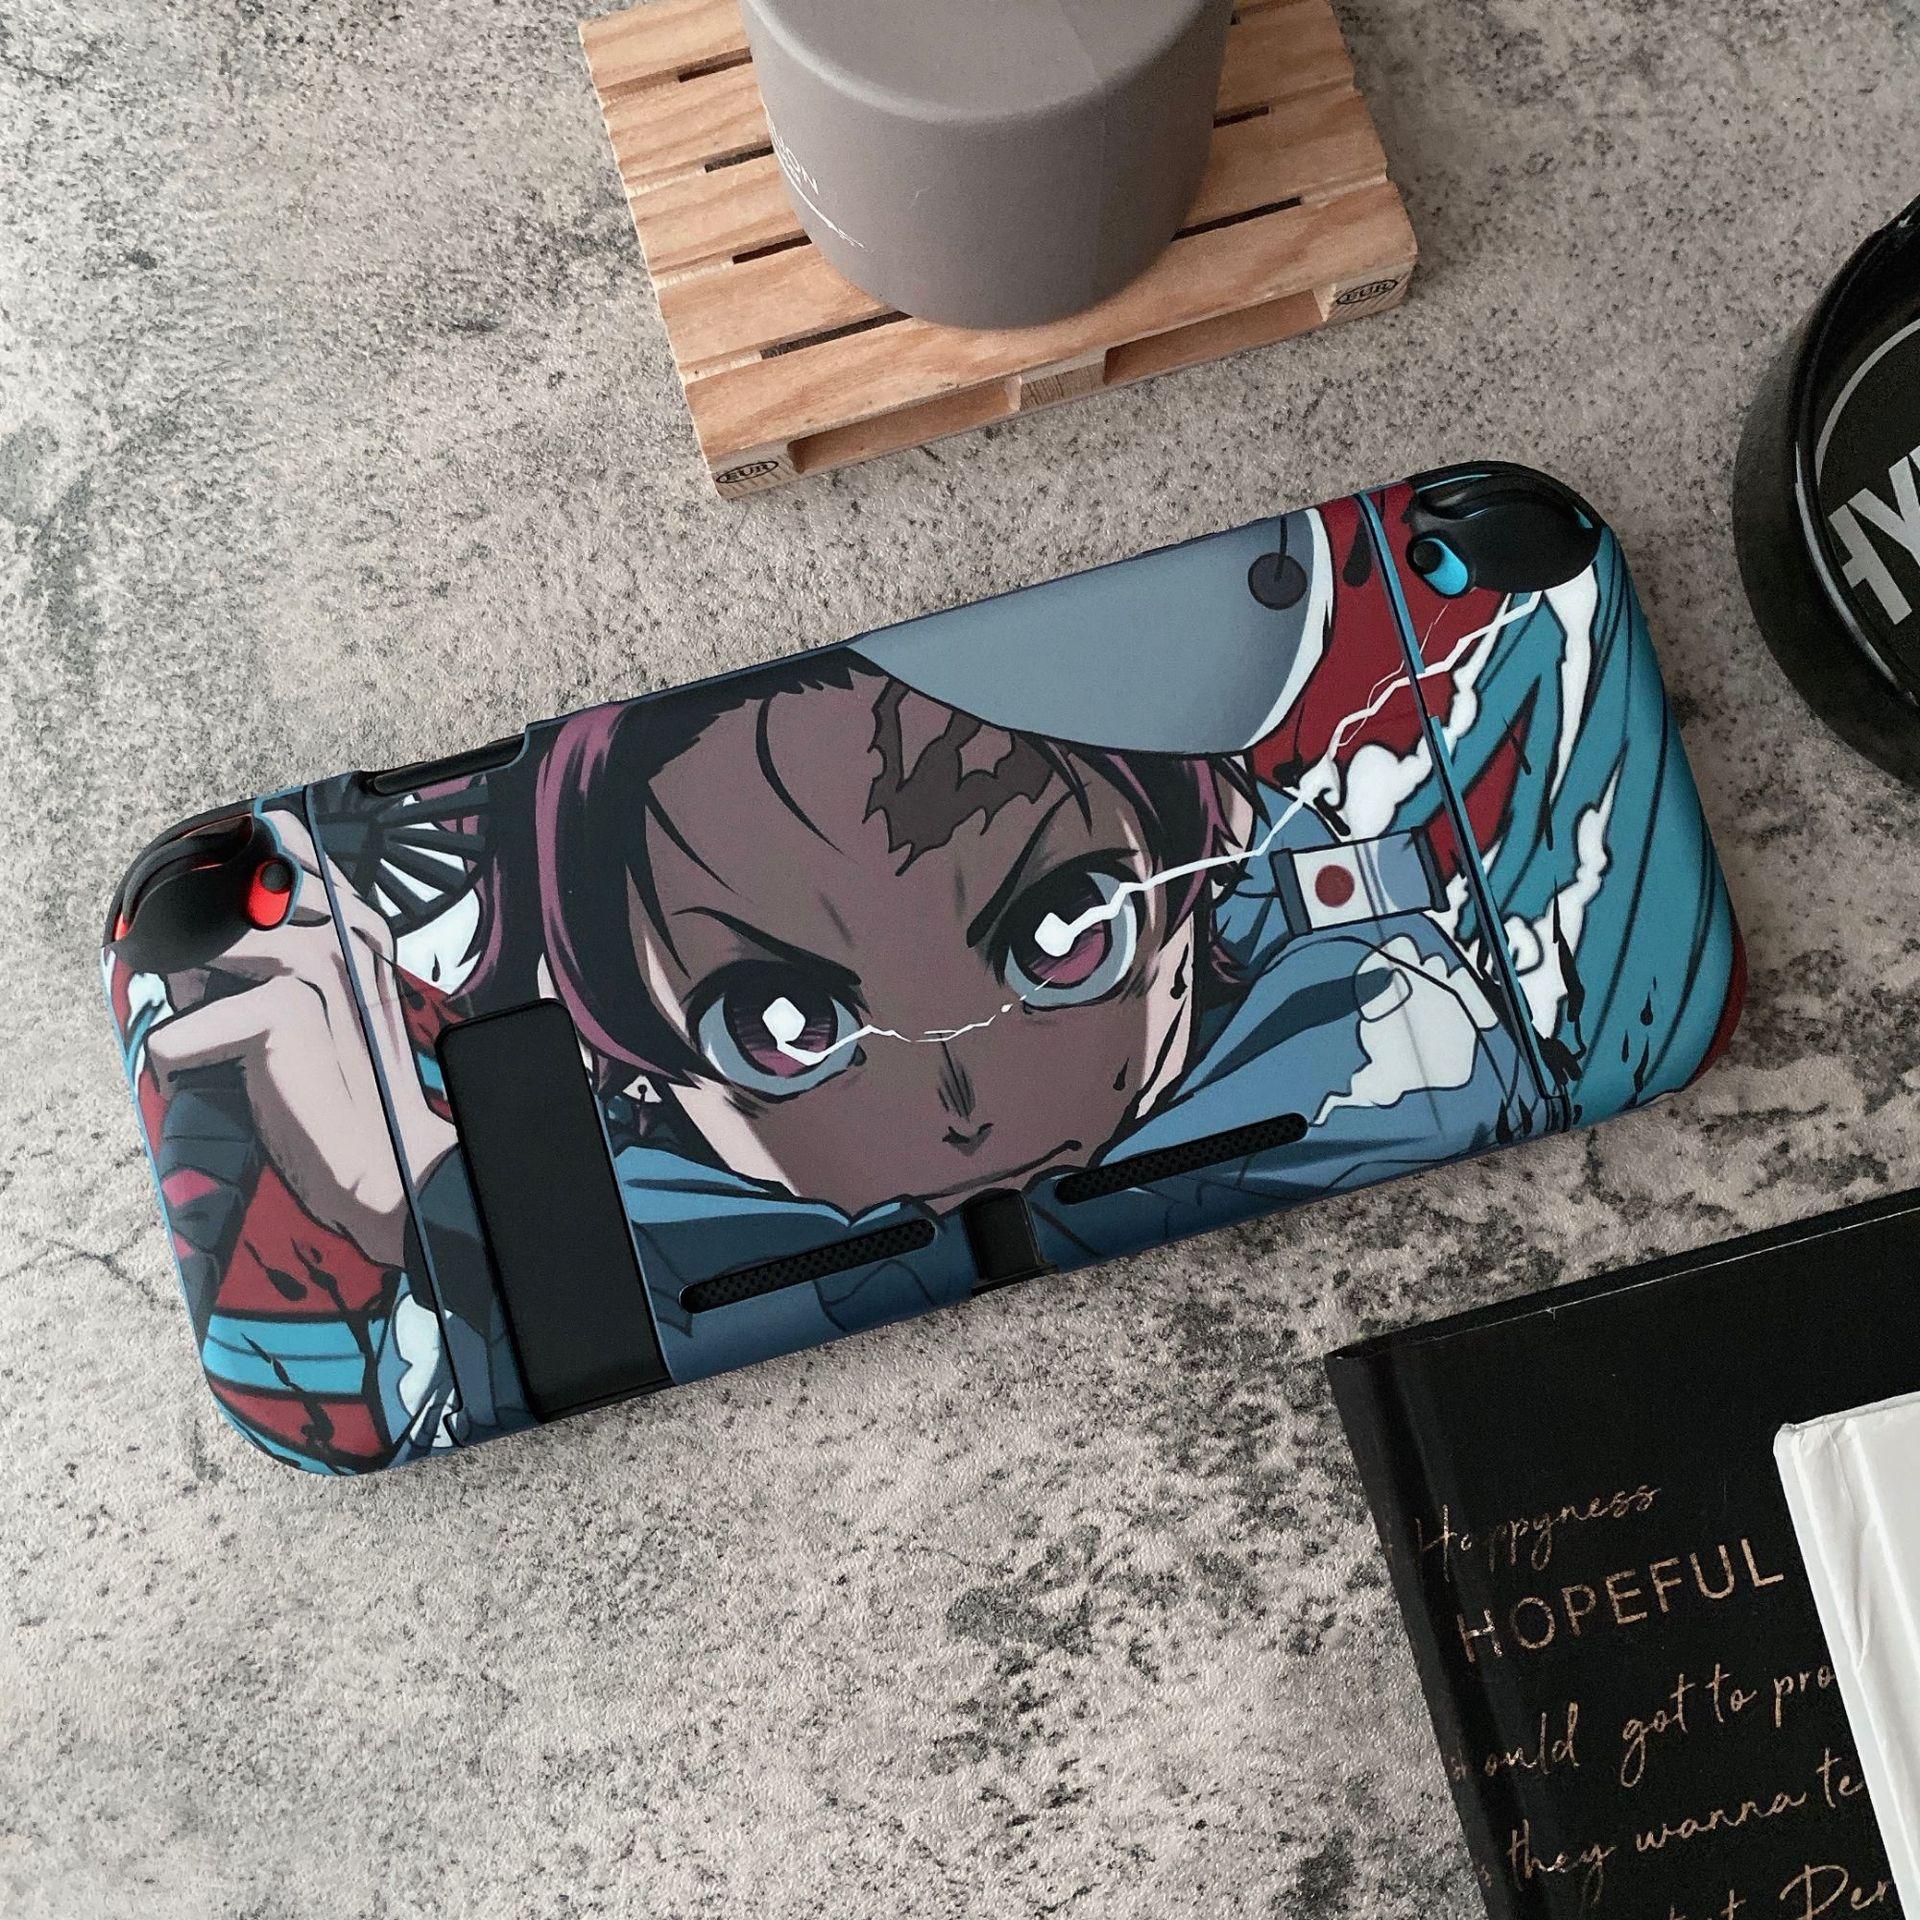 Anime Demon Slayer Kimetsu No Yaiba For Tanjiro Nintendo Switch Shell Protective Case